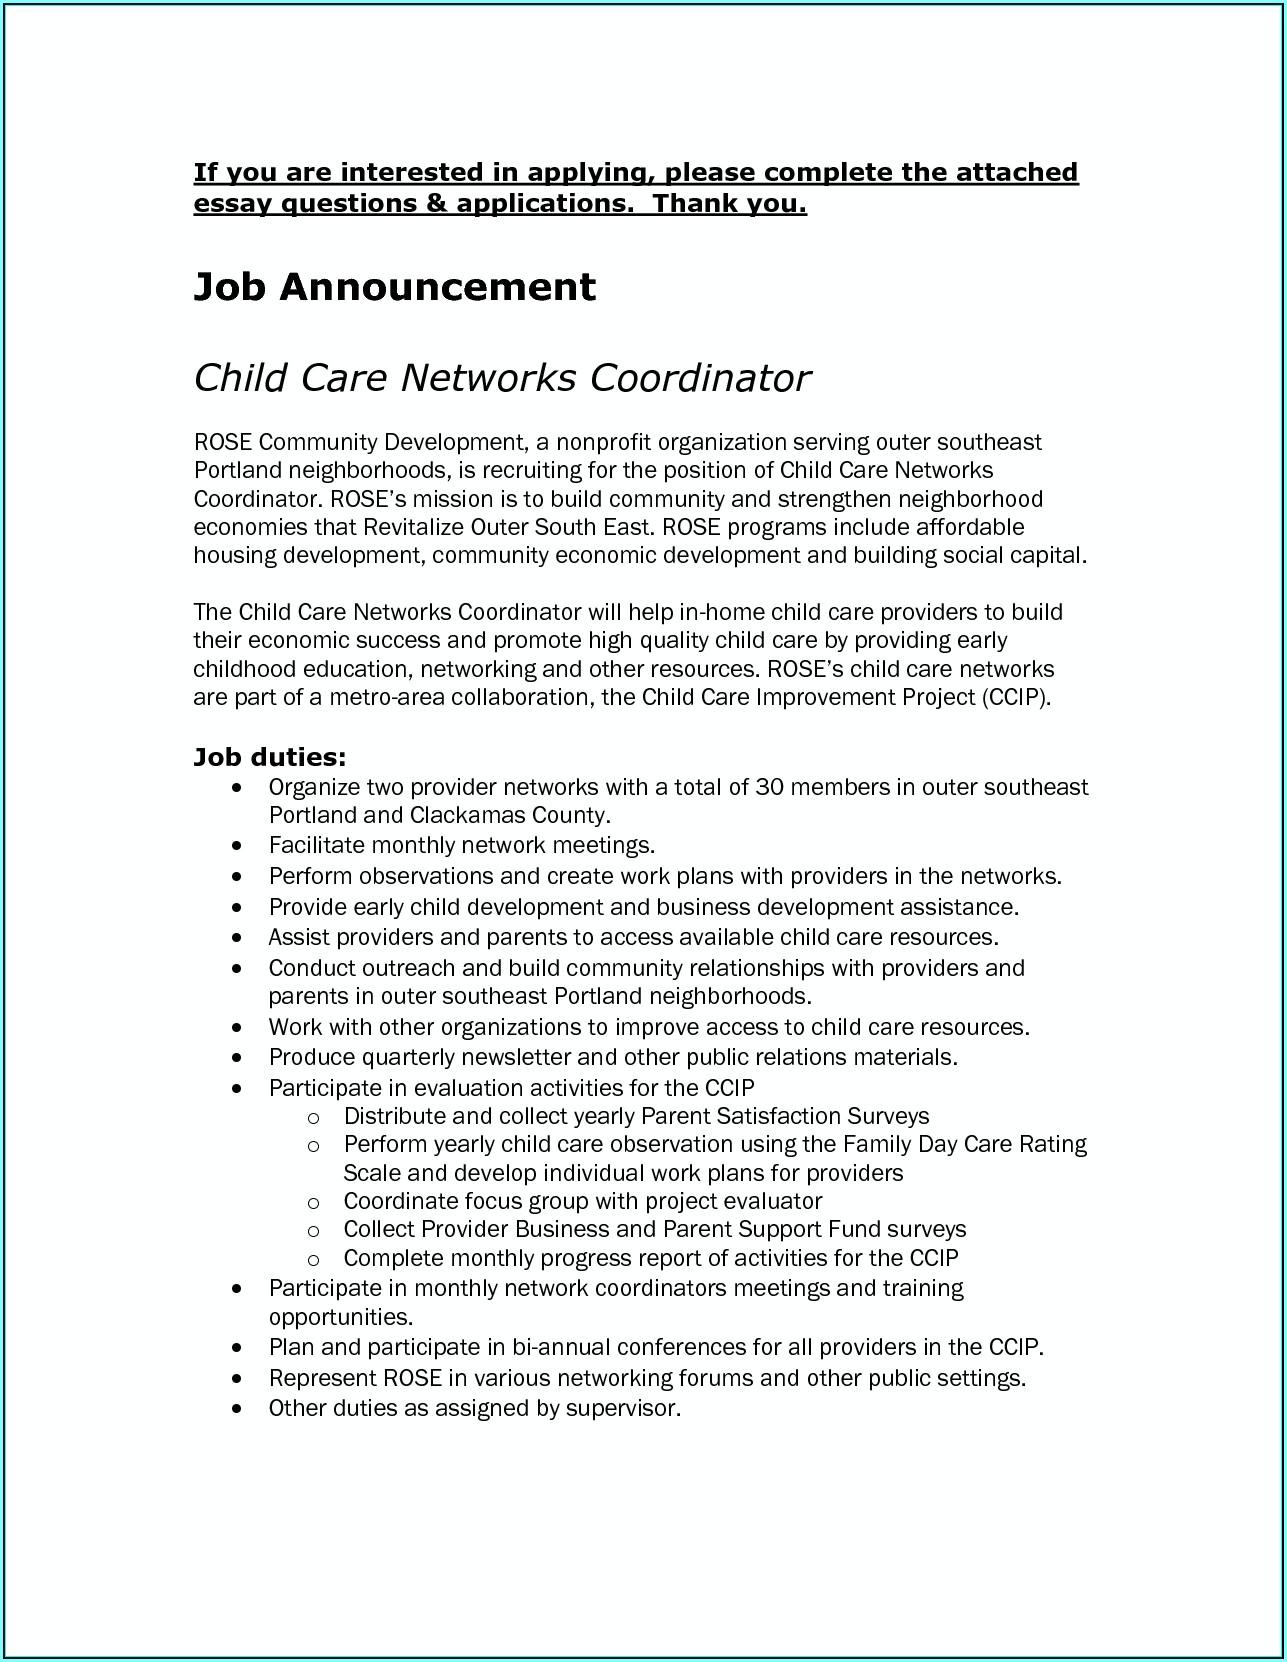 Resume Templates For Cna Job